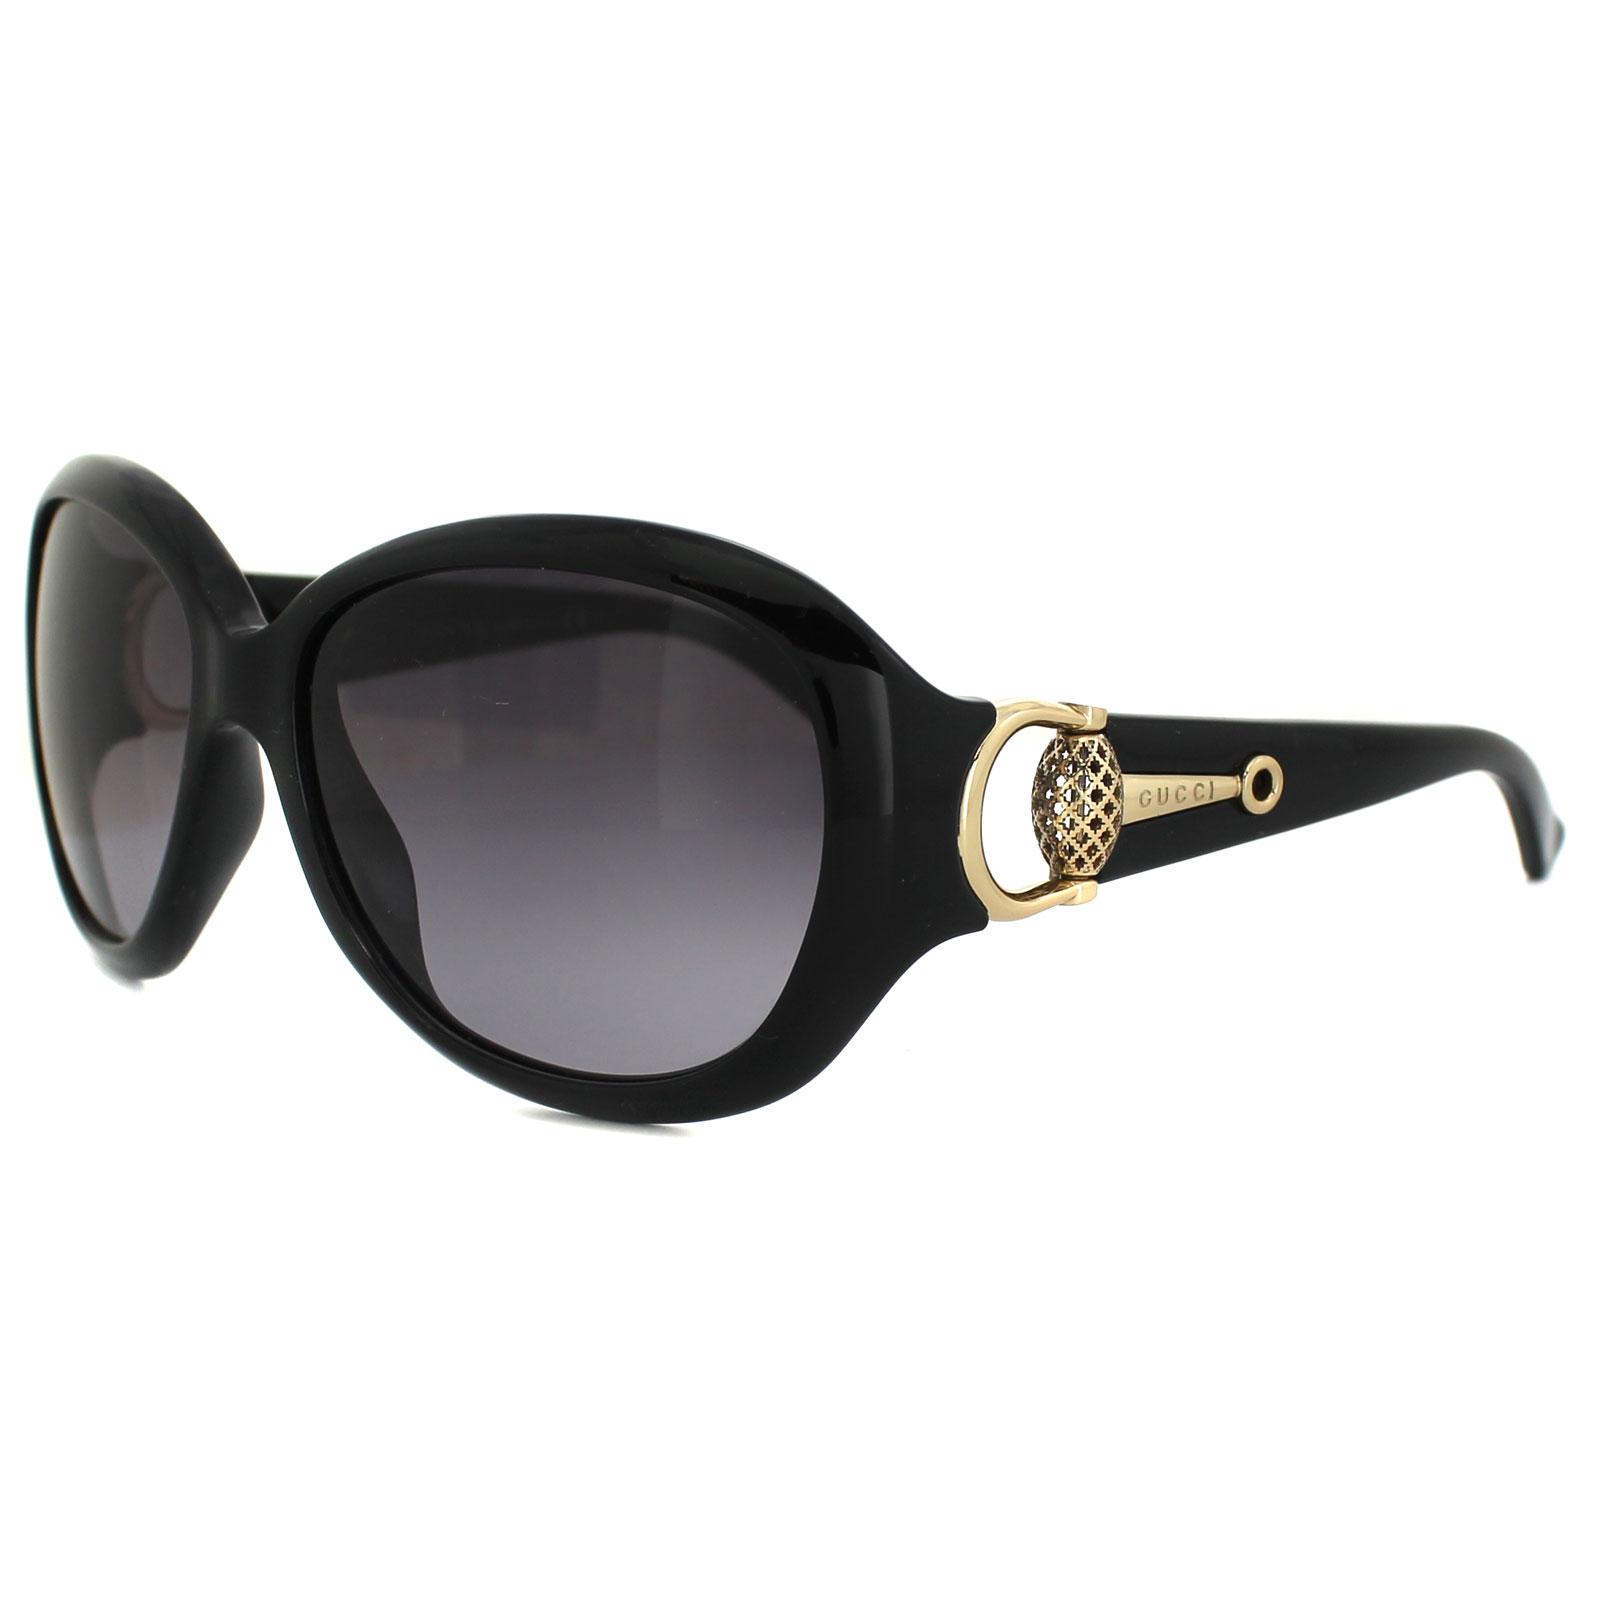 Gucci Gafas de sol 3712 D28 EU Brillante Negras Grises Degradadas   eBay